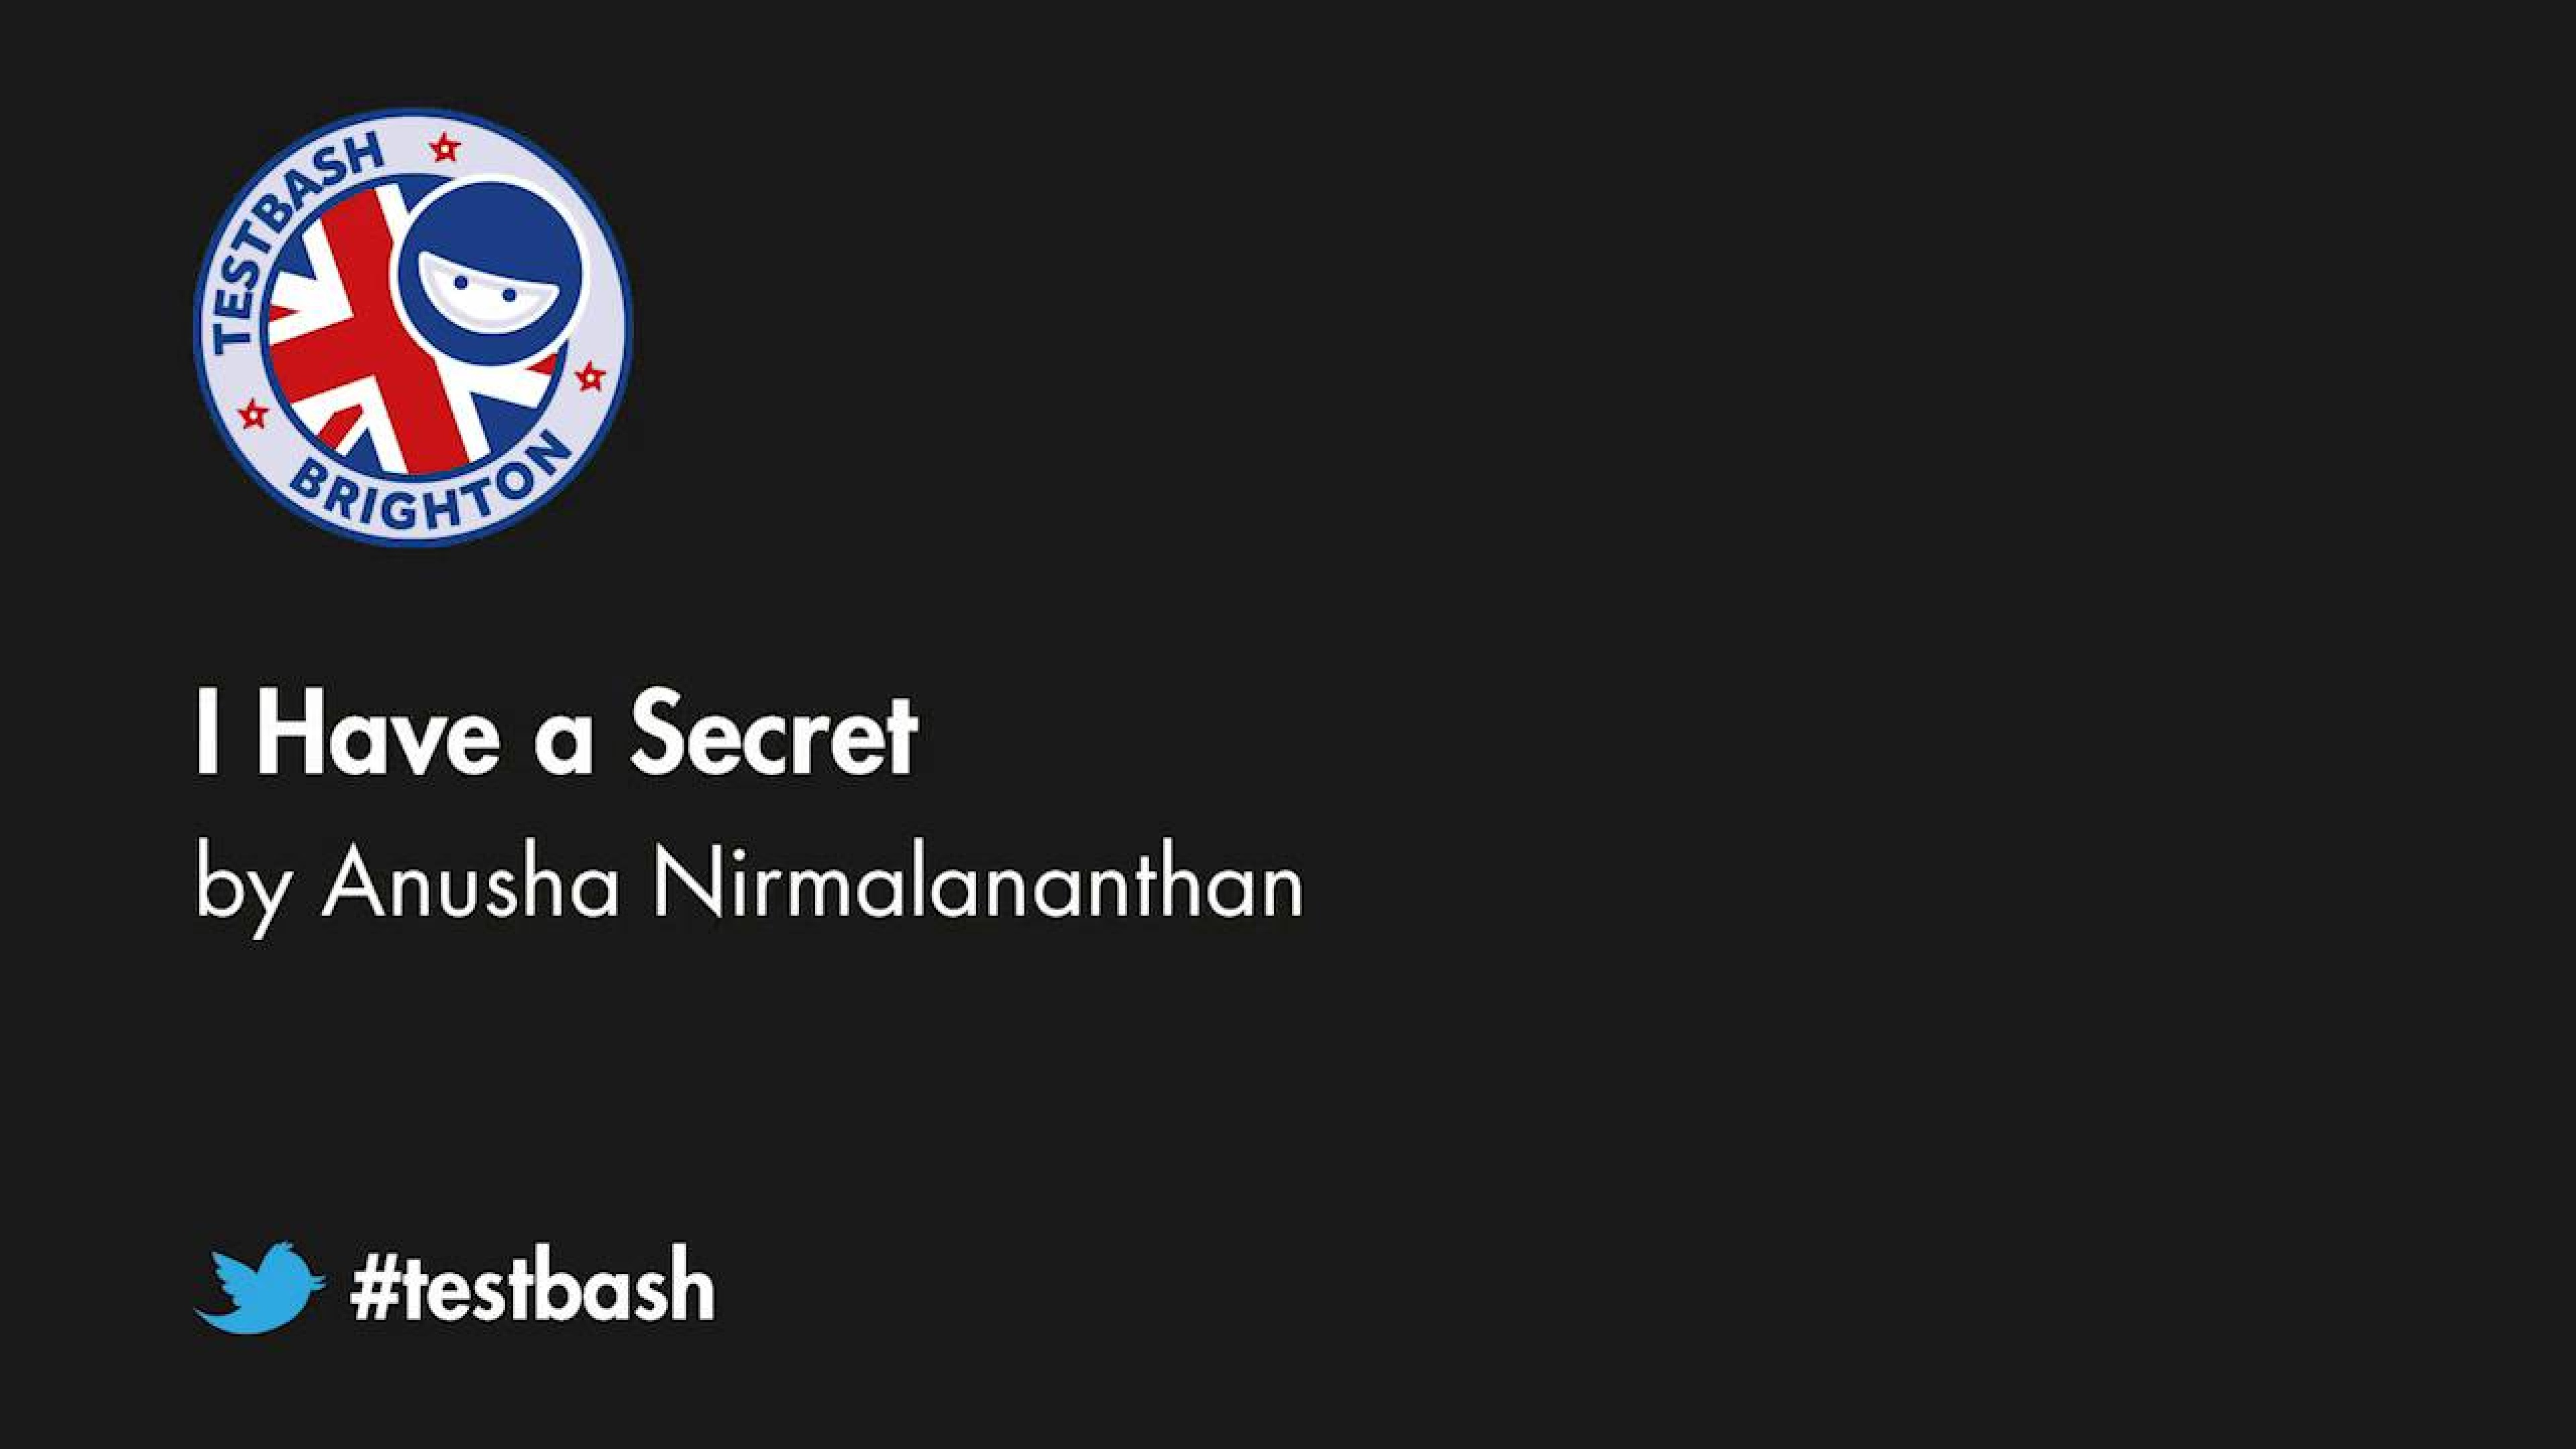 I Have A Secret - Anusha Nirmalananthan